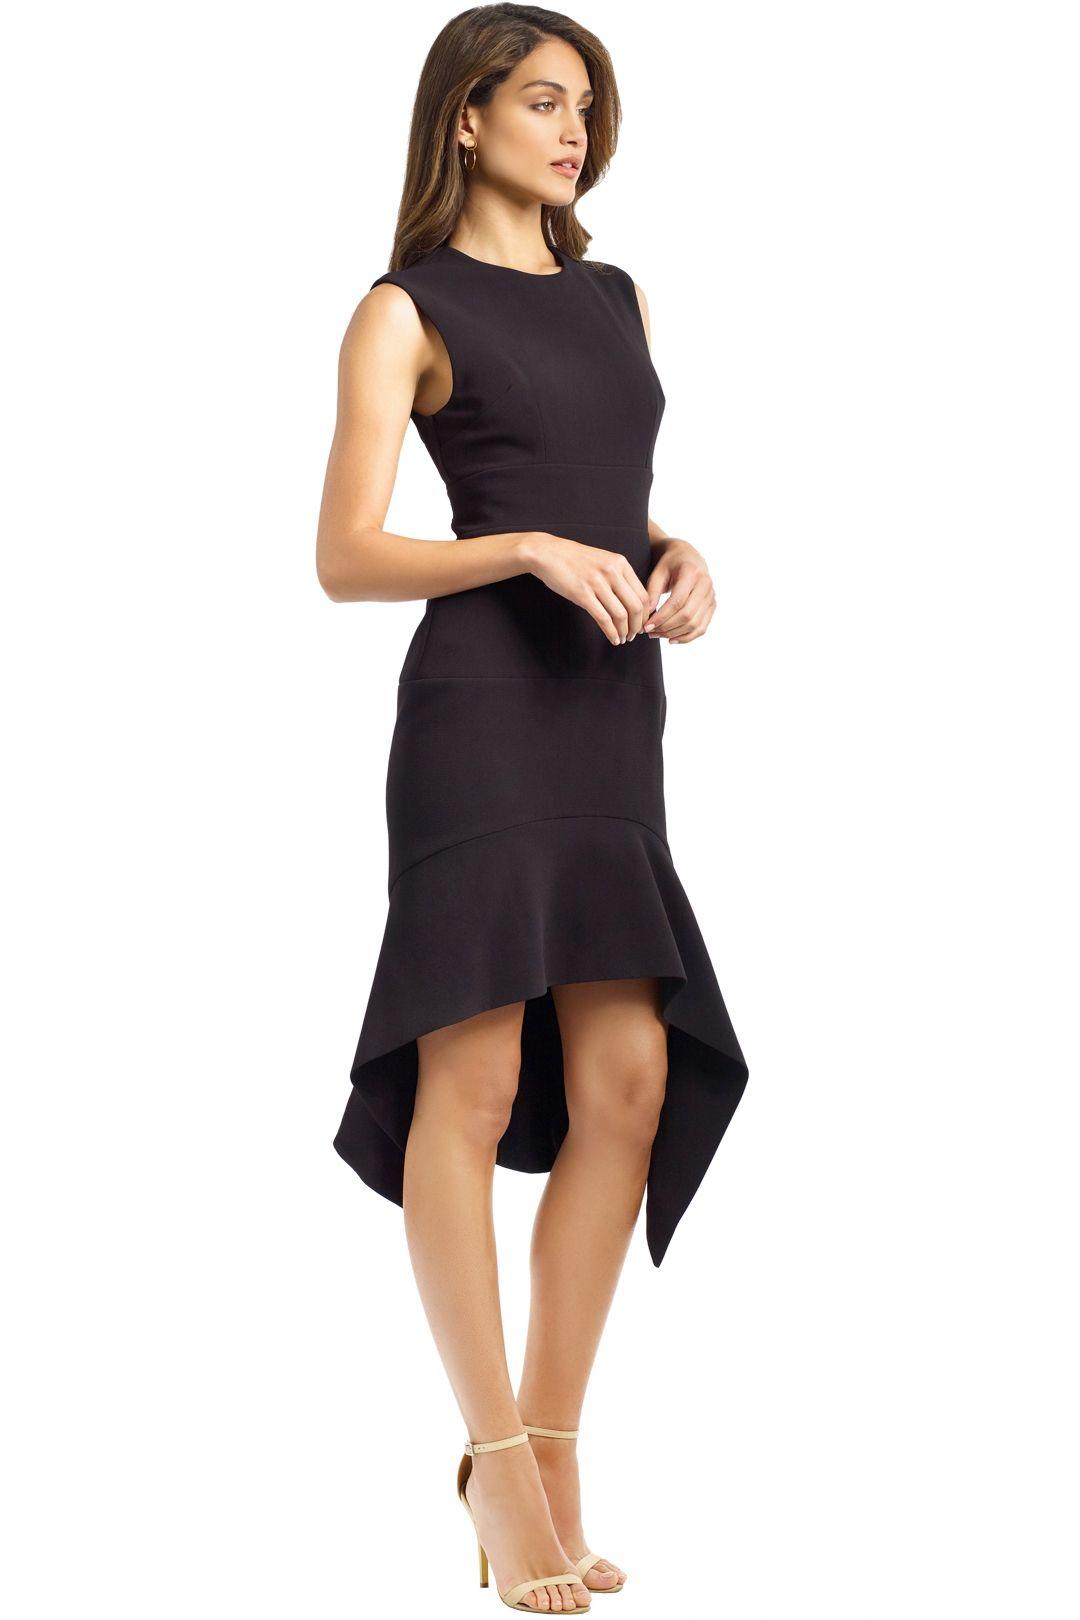 By Johnny - Midnight Panel Shift Dress - Black - Side